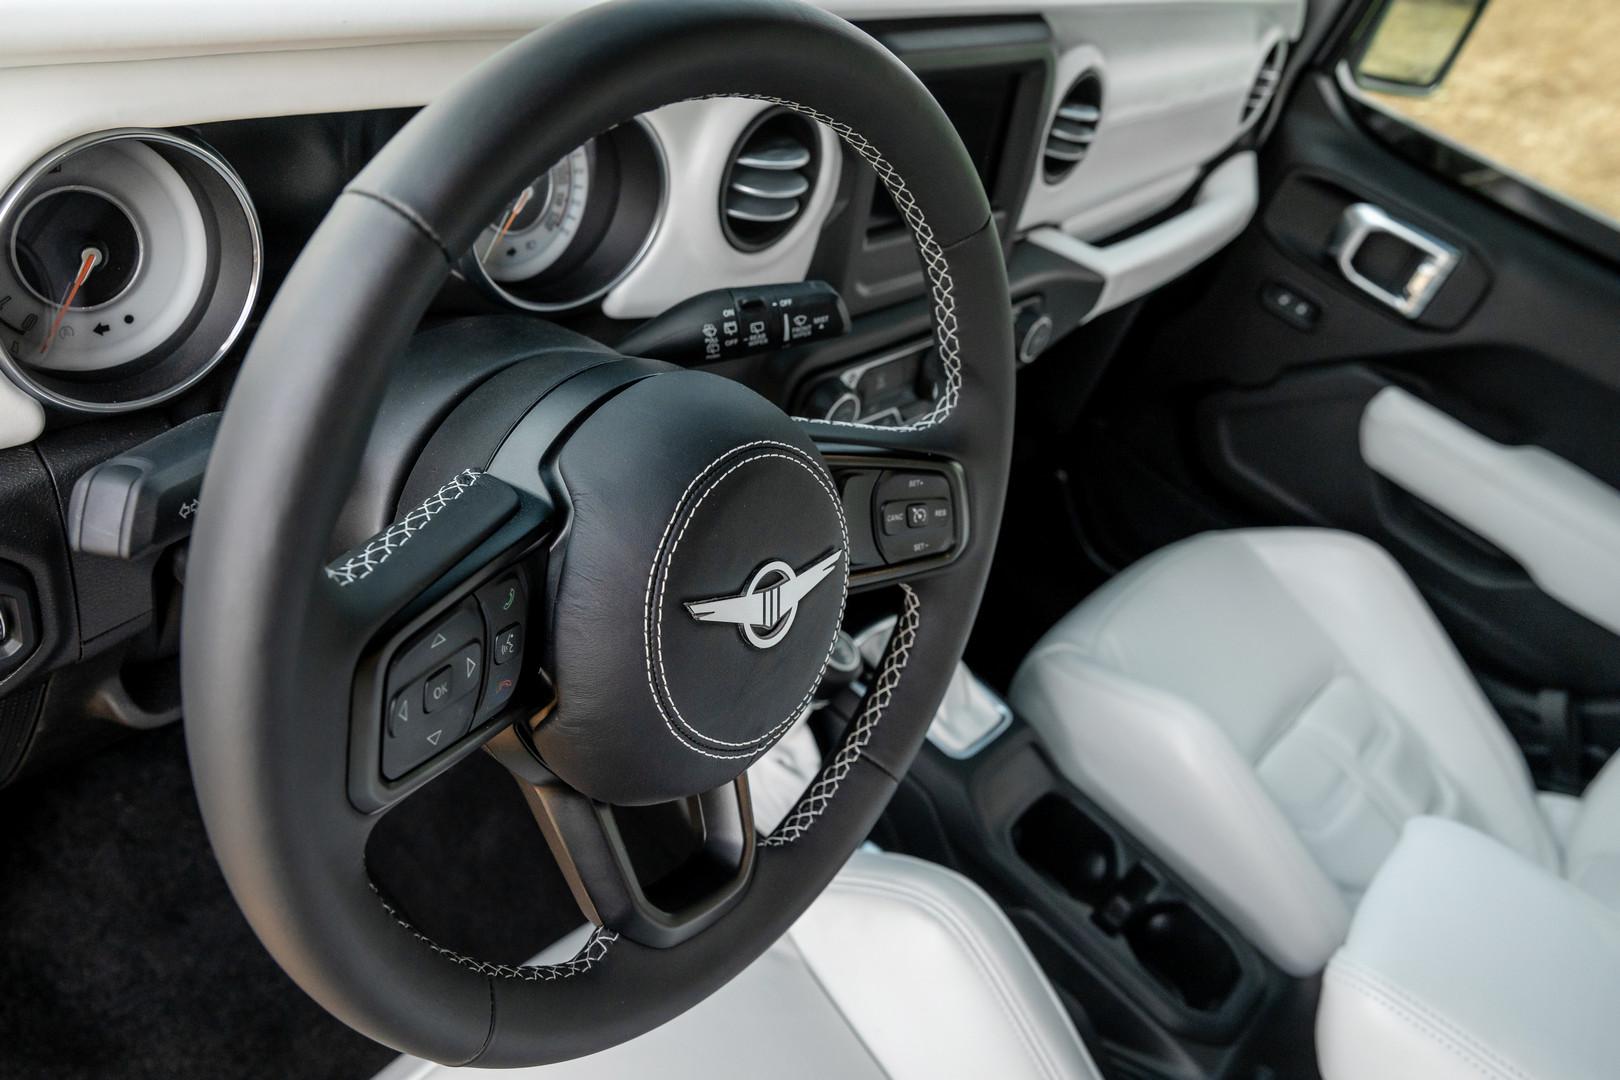 2020 rezvani tank steering wheel